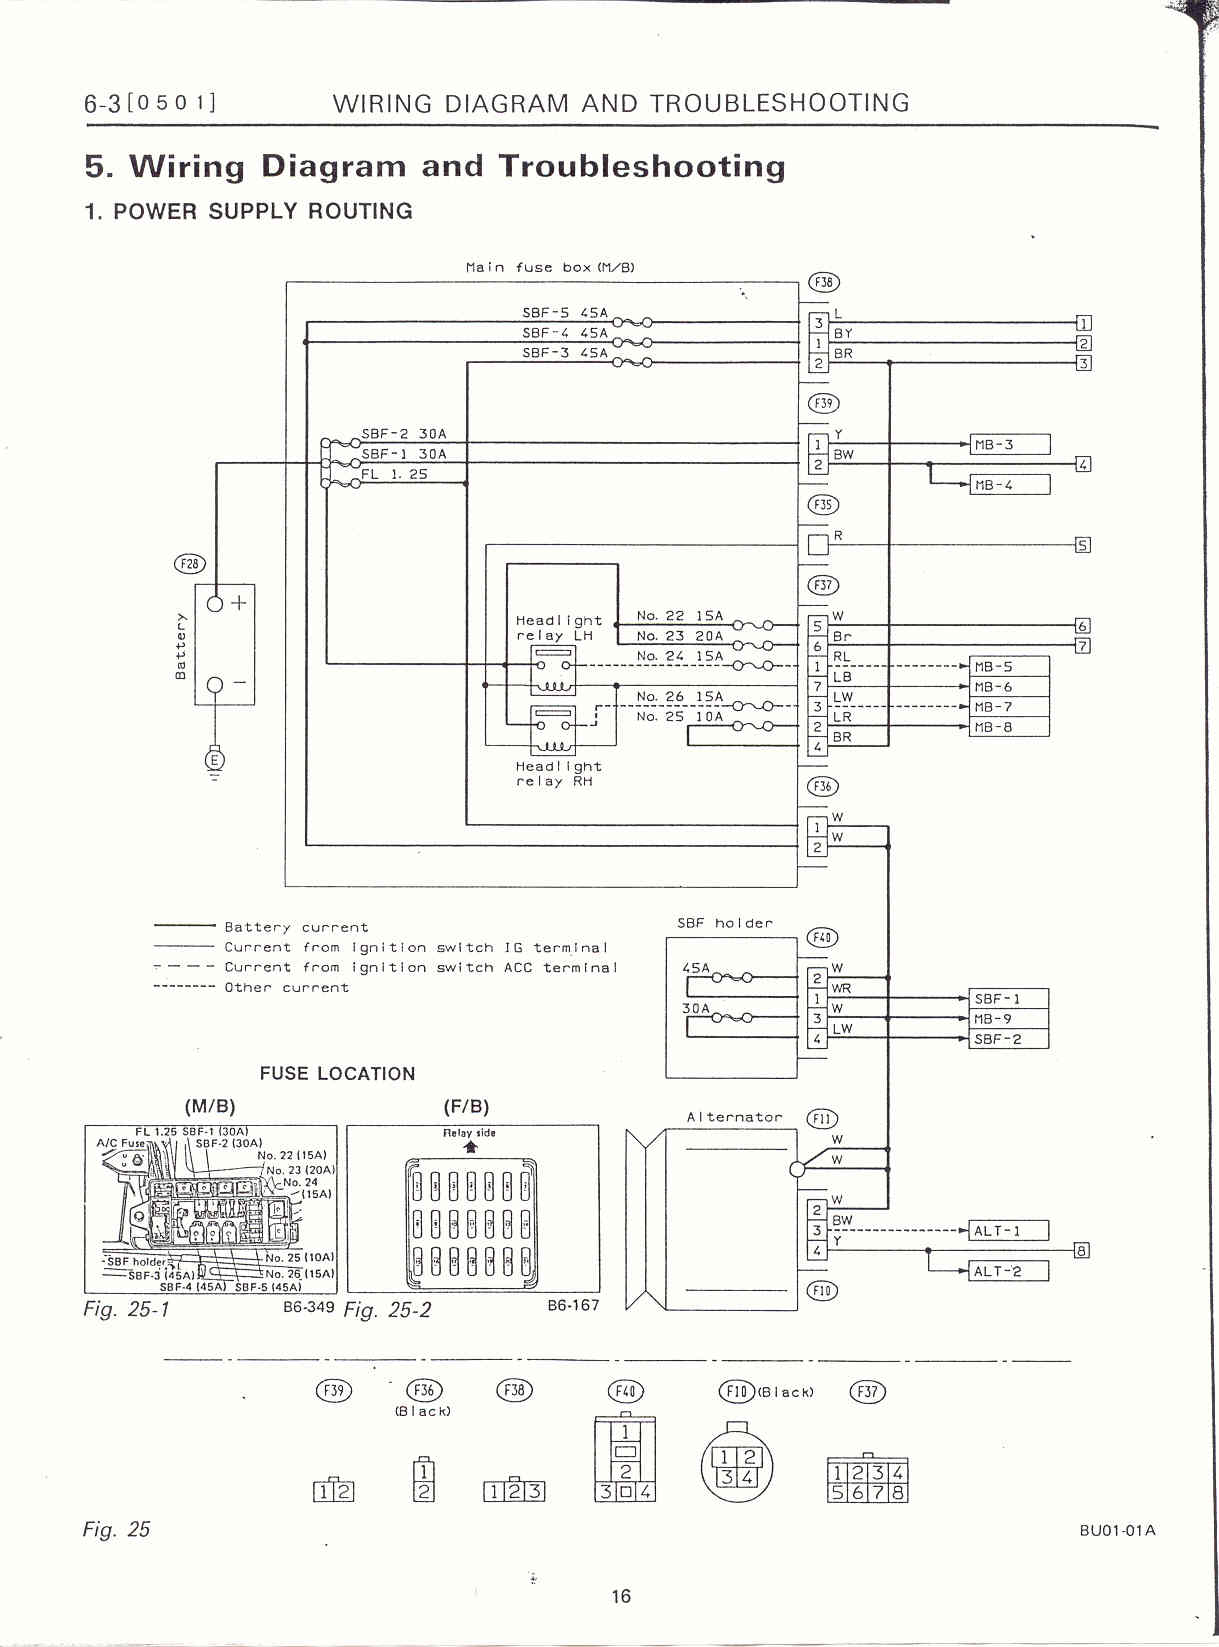 1995 subaru legacy headlight wiring diagram: 95 subaru legacy headlight  wiring diagram - wiring diagramsrh